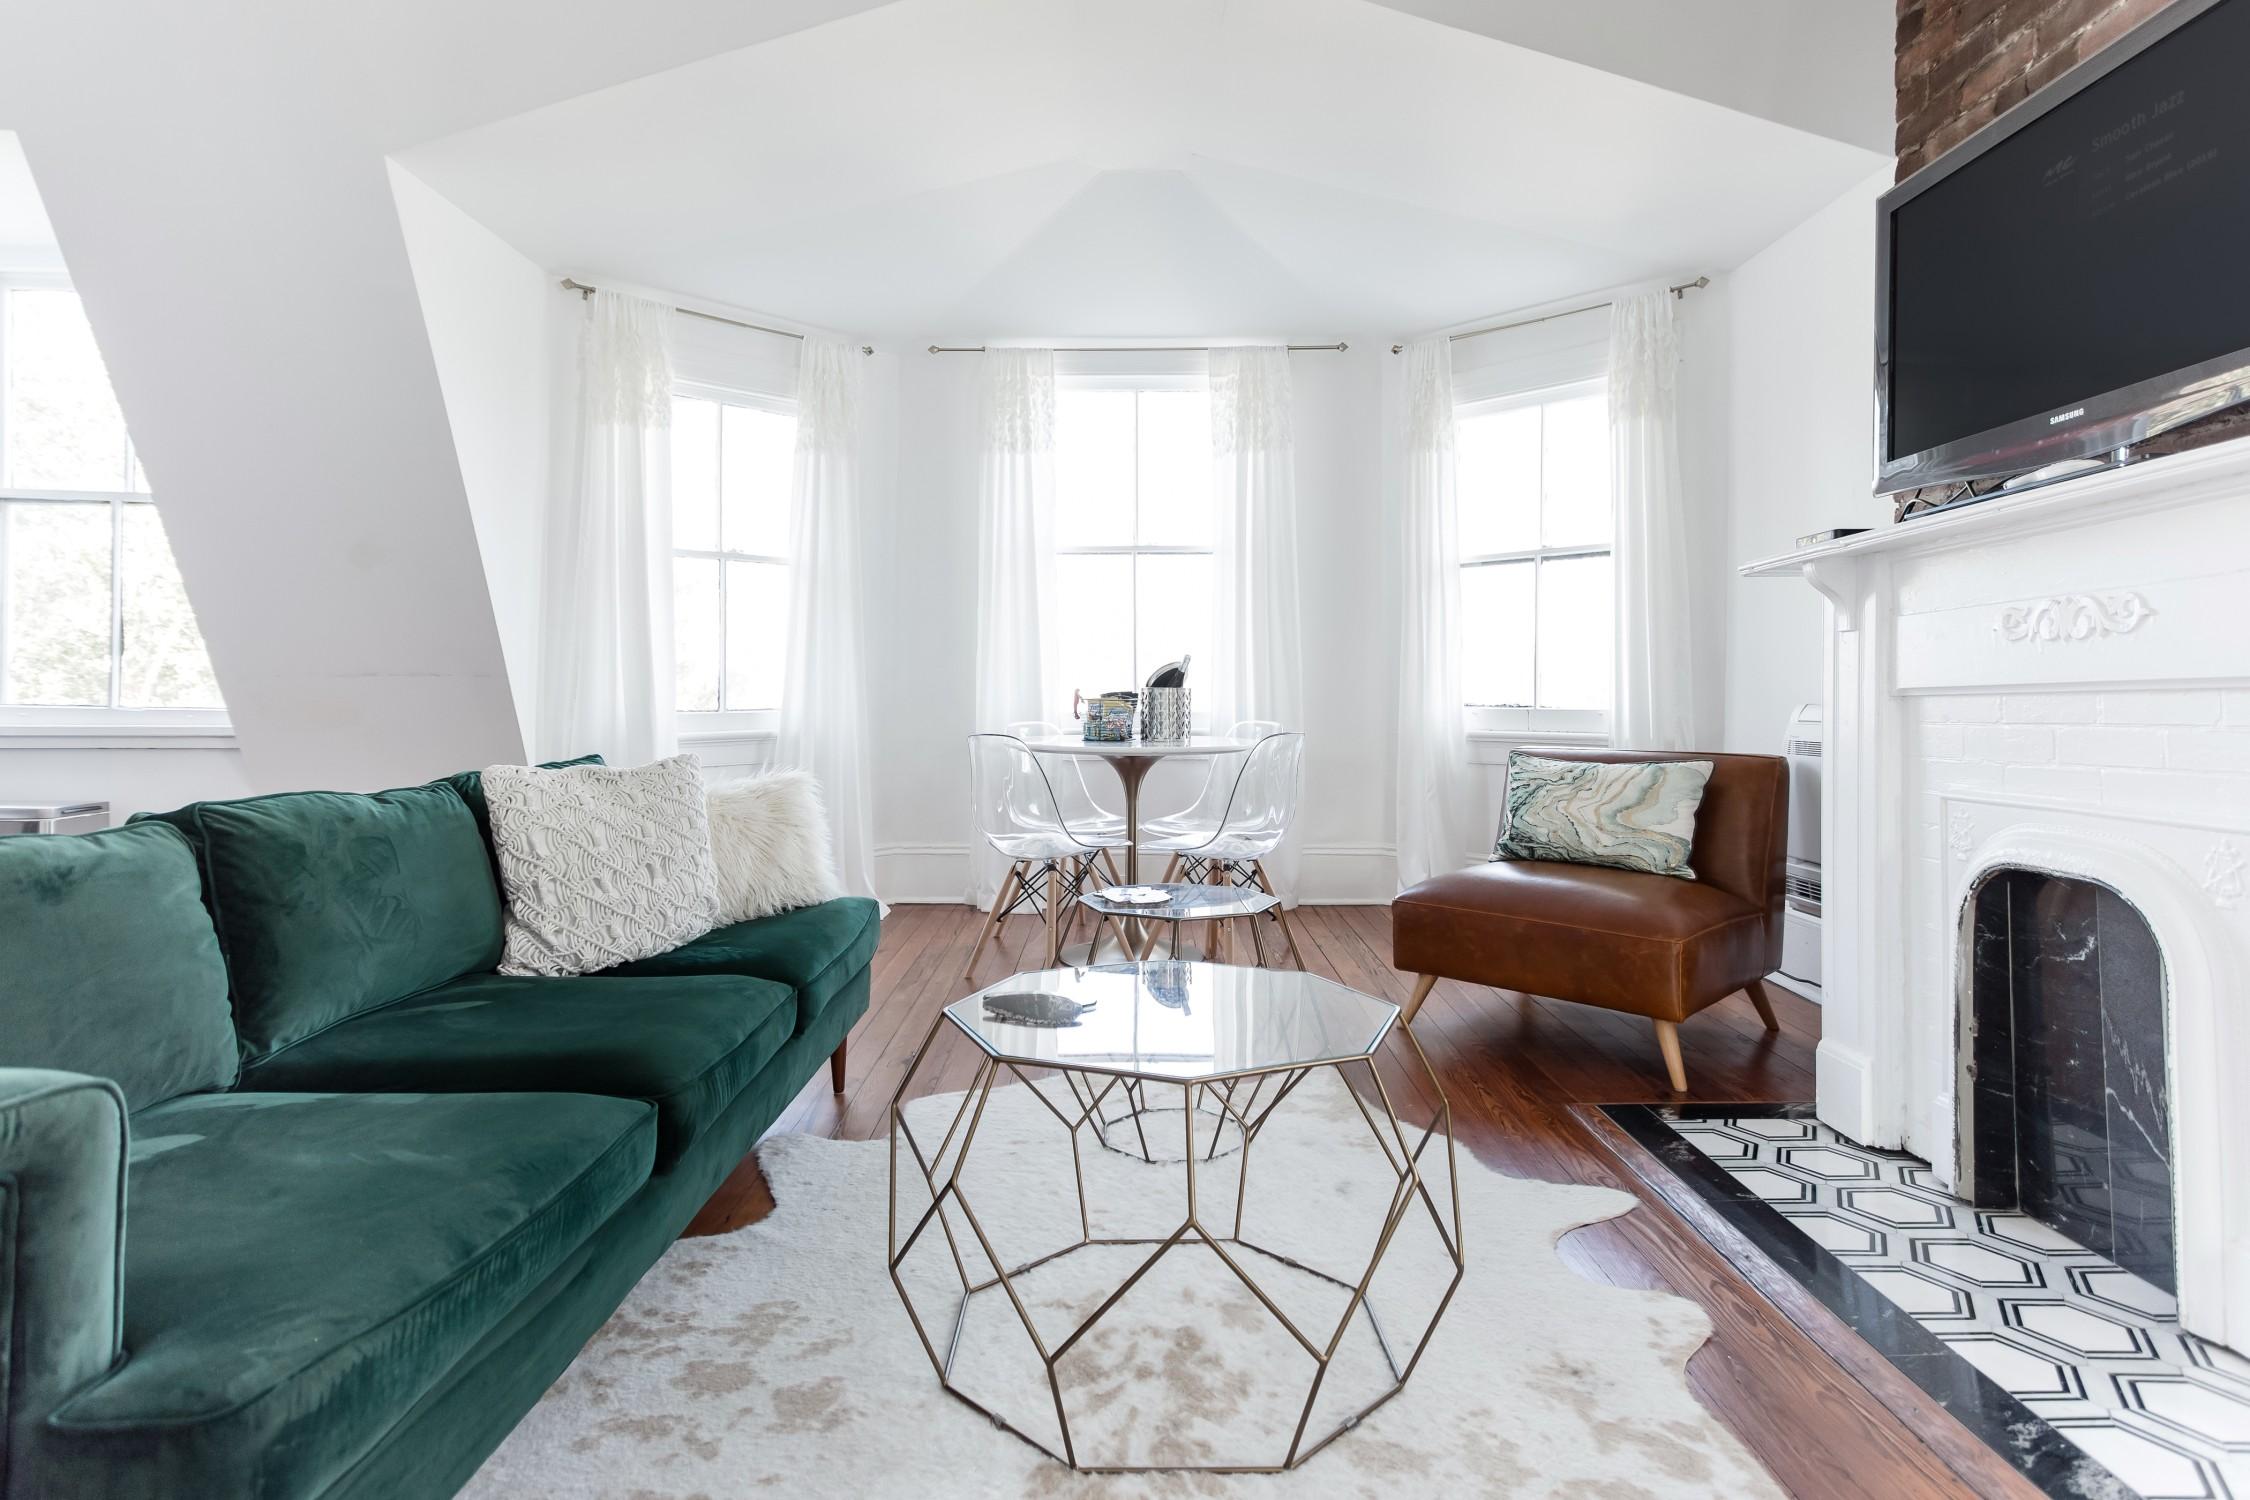 Luxury Airbnb Savannah Georgia